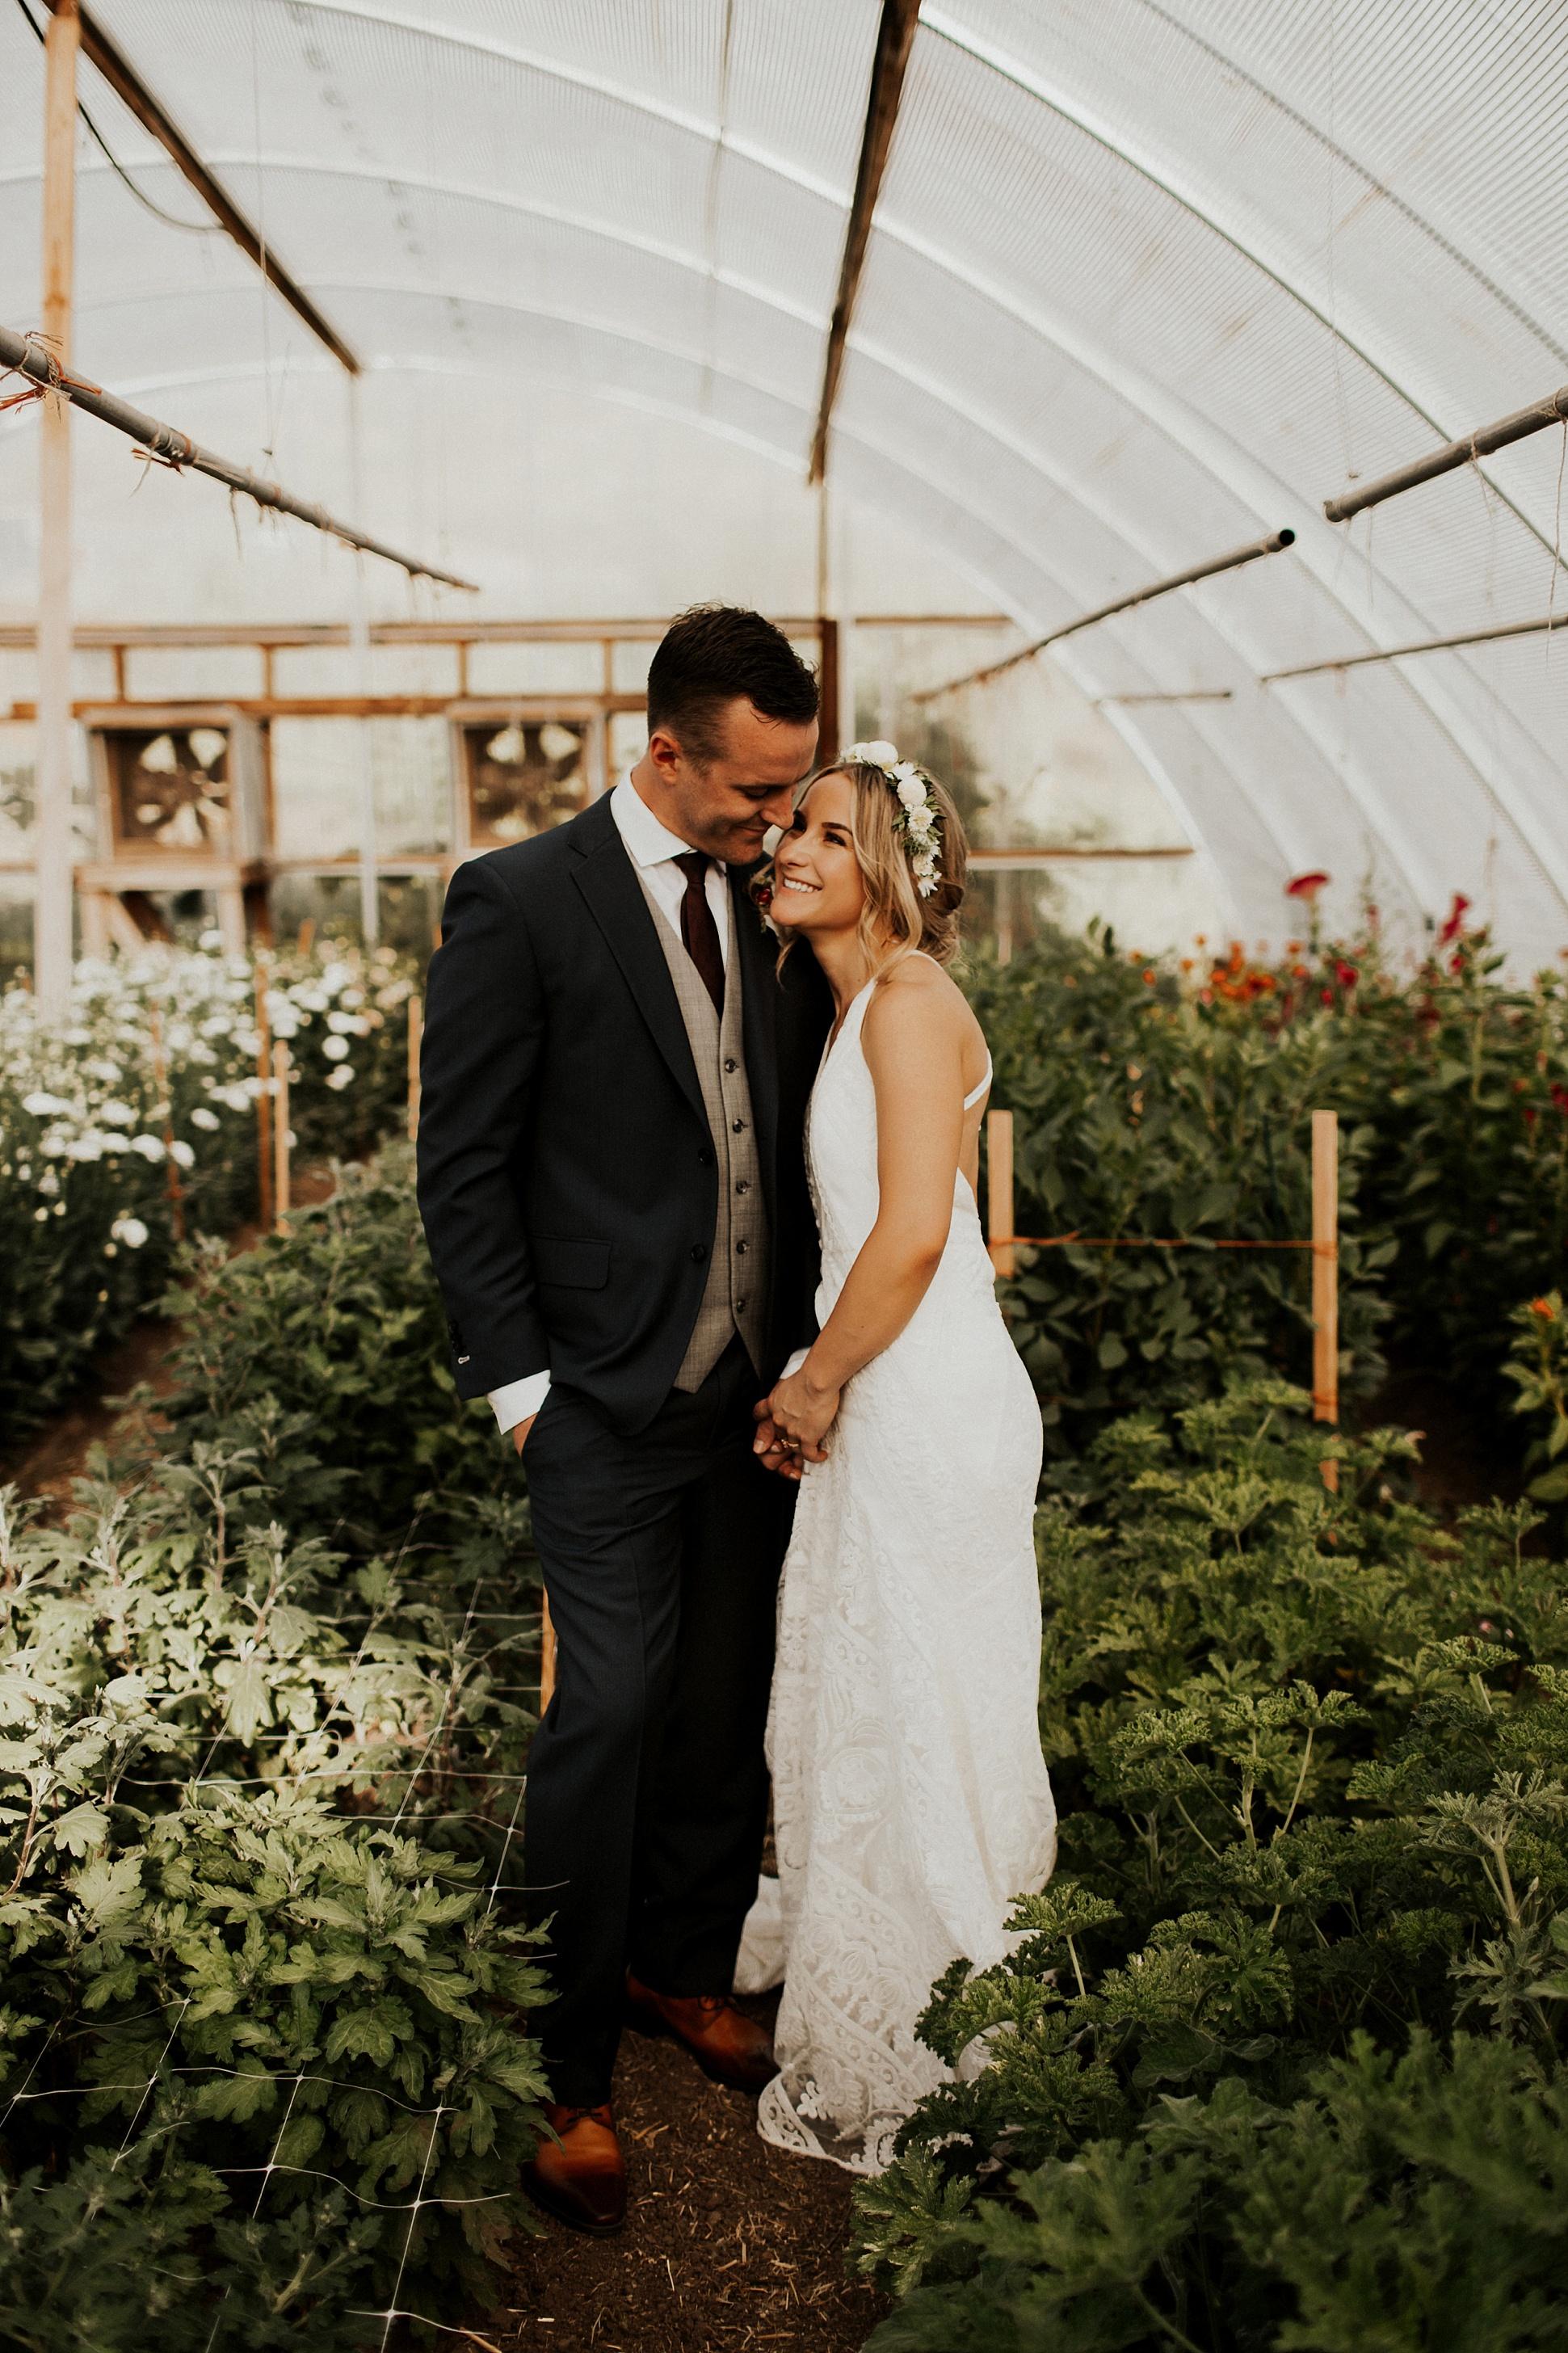 lyons_farmette_colorado_wedding005.JPG